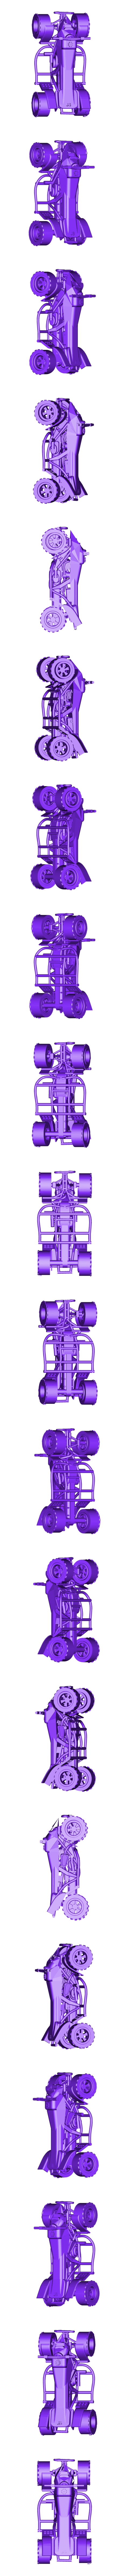 quad-totaal.stl Download free STL file quad bombardier DS 650 • 3D printer object, jasperbaudoin